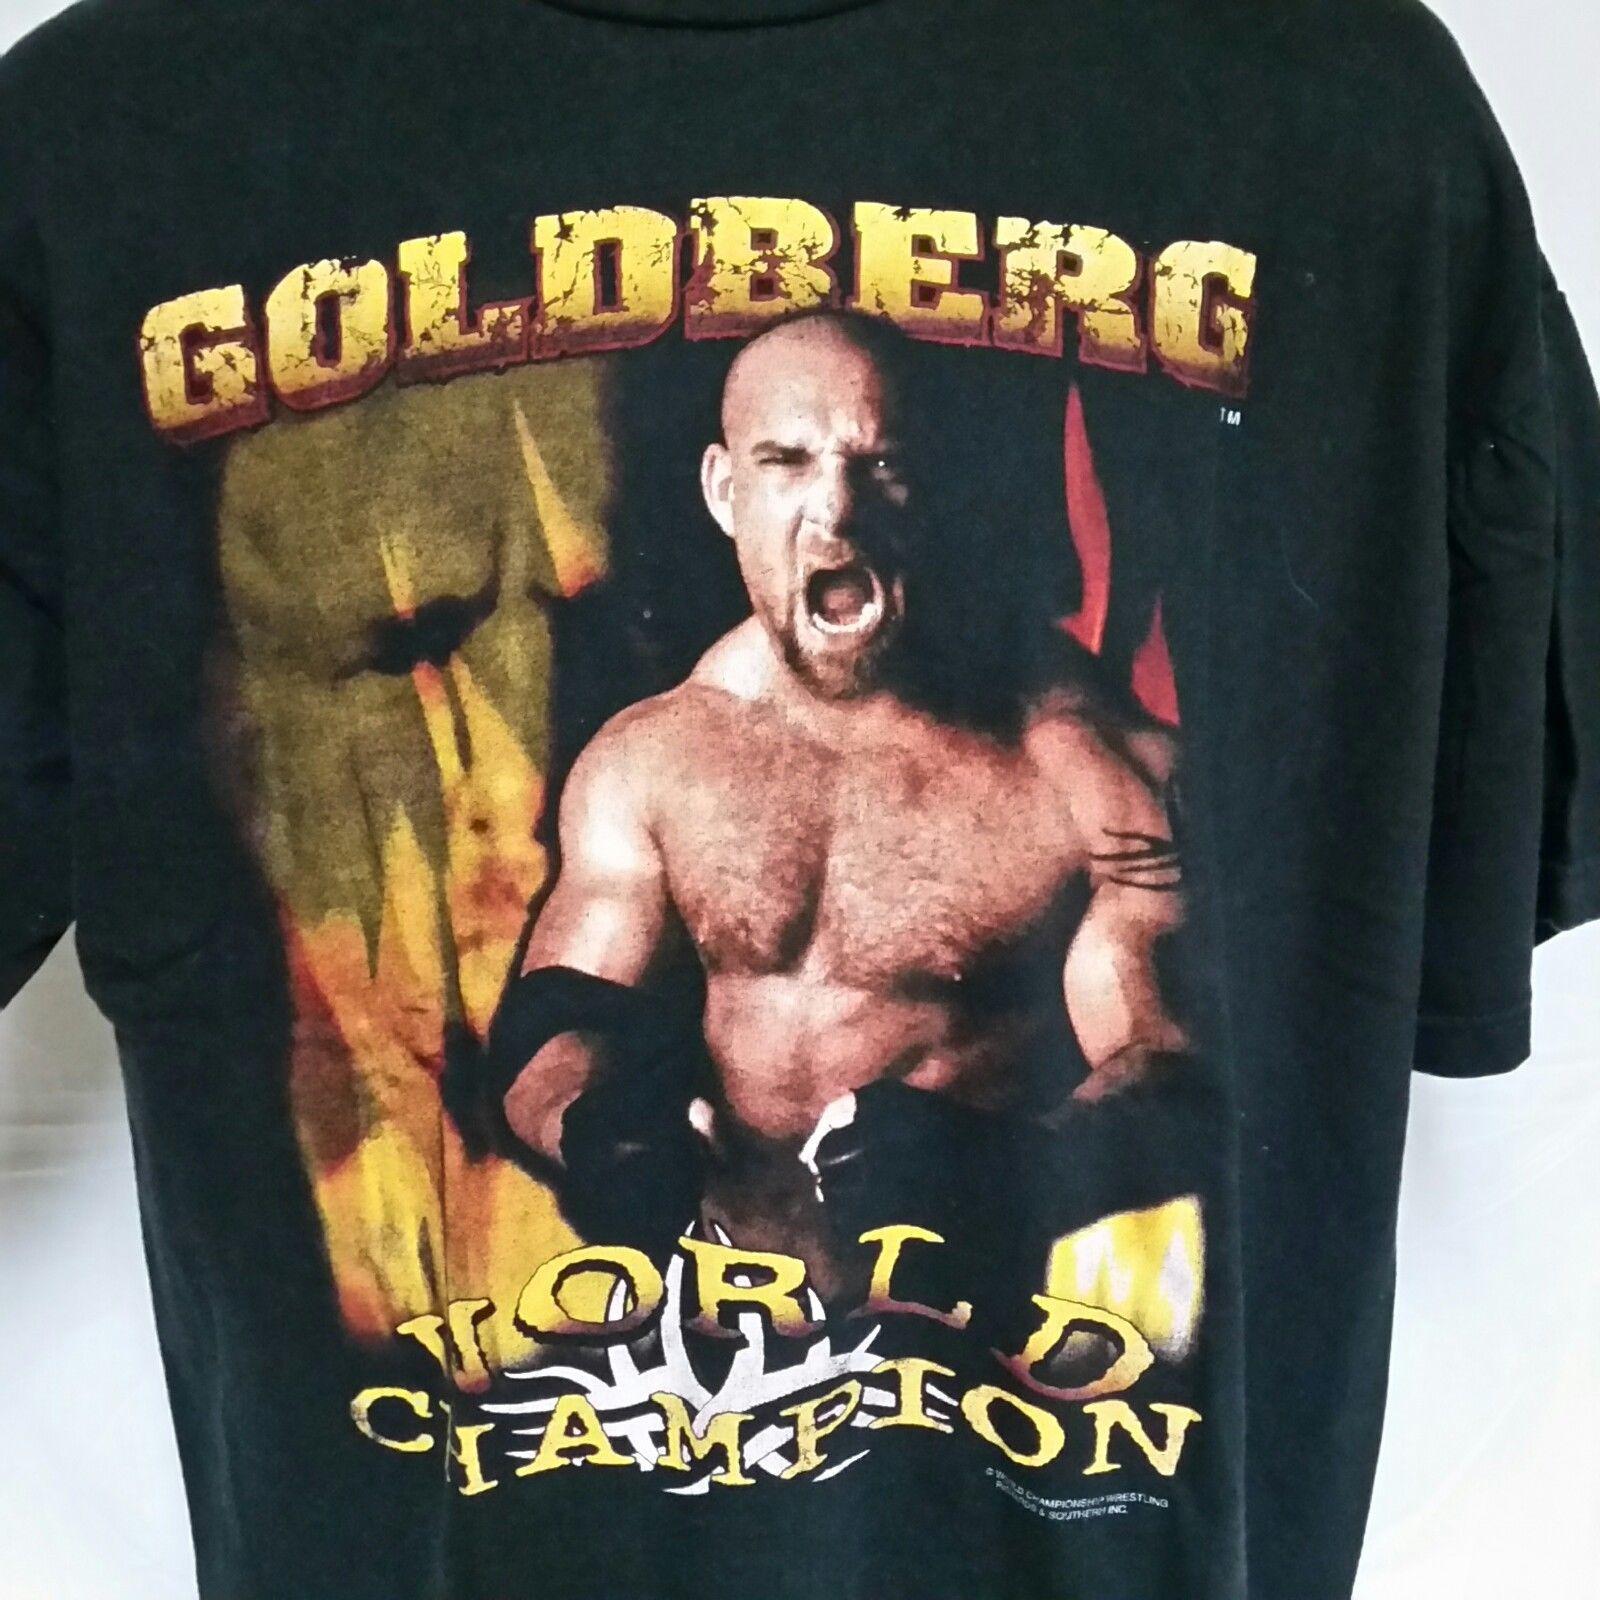 VTG 90s Bill Godlberg WCW Wrestling T Shirt Champion Sting Stone Cold XXL 2XL